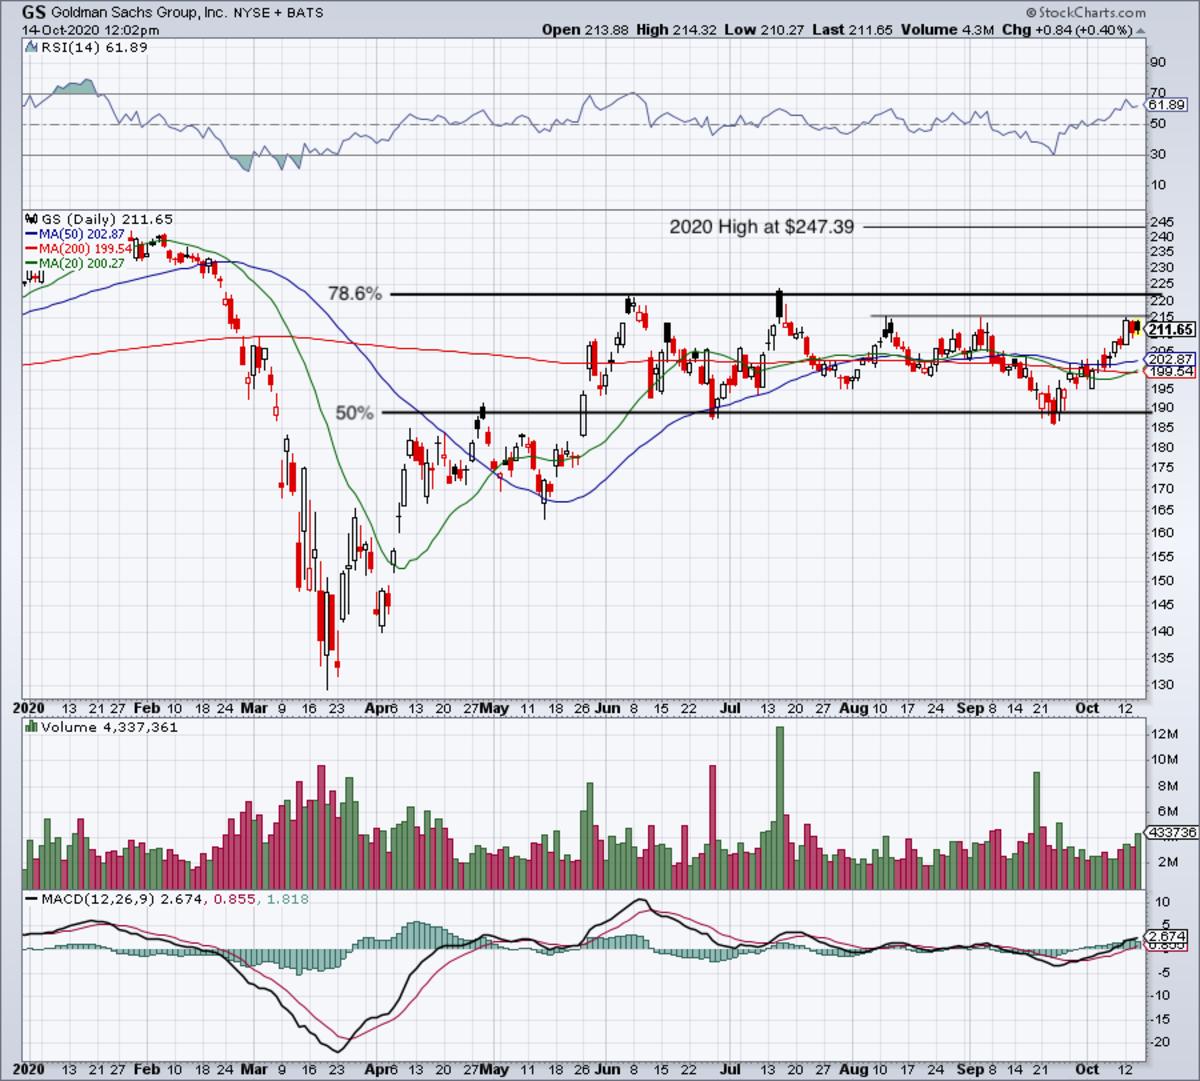 Daily chart of Goldman Sachs stock.